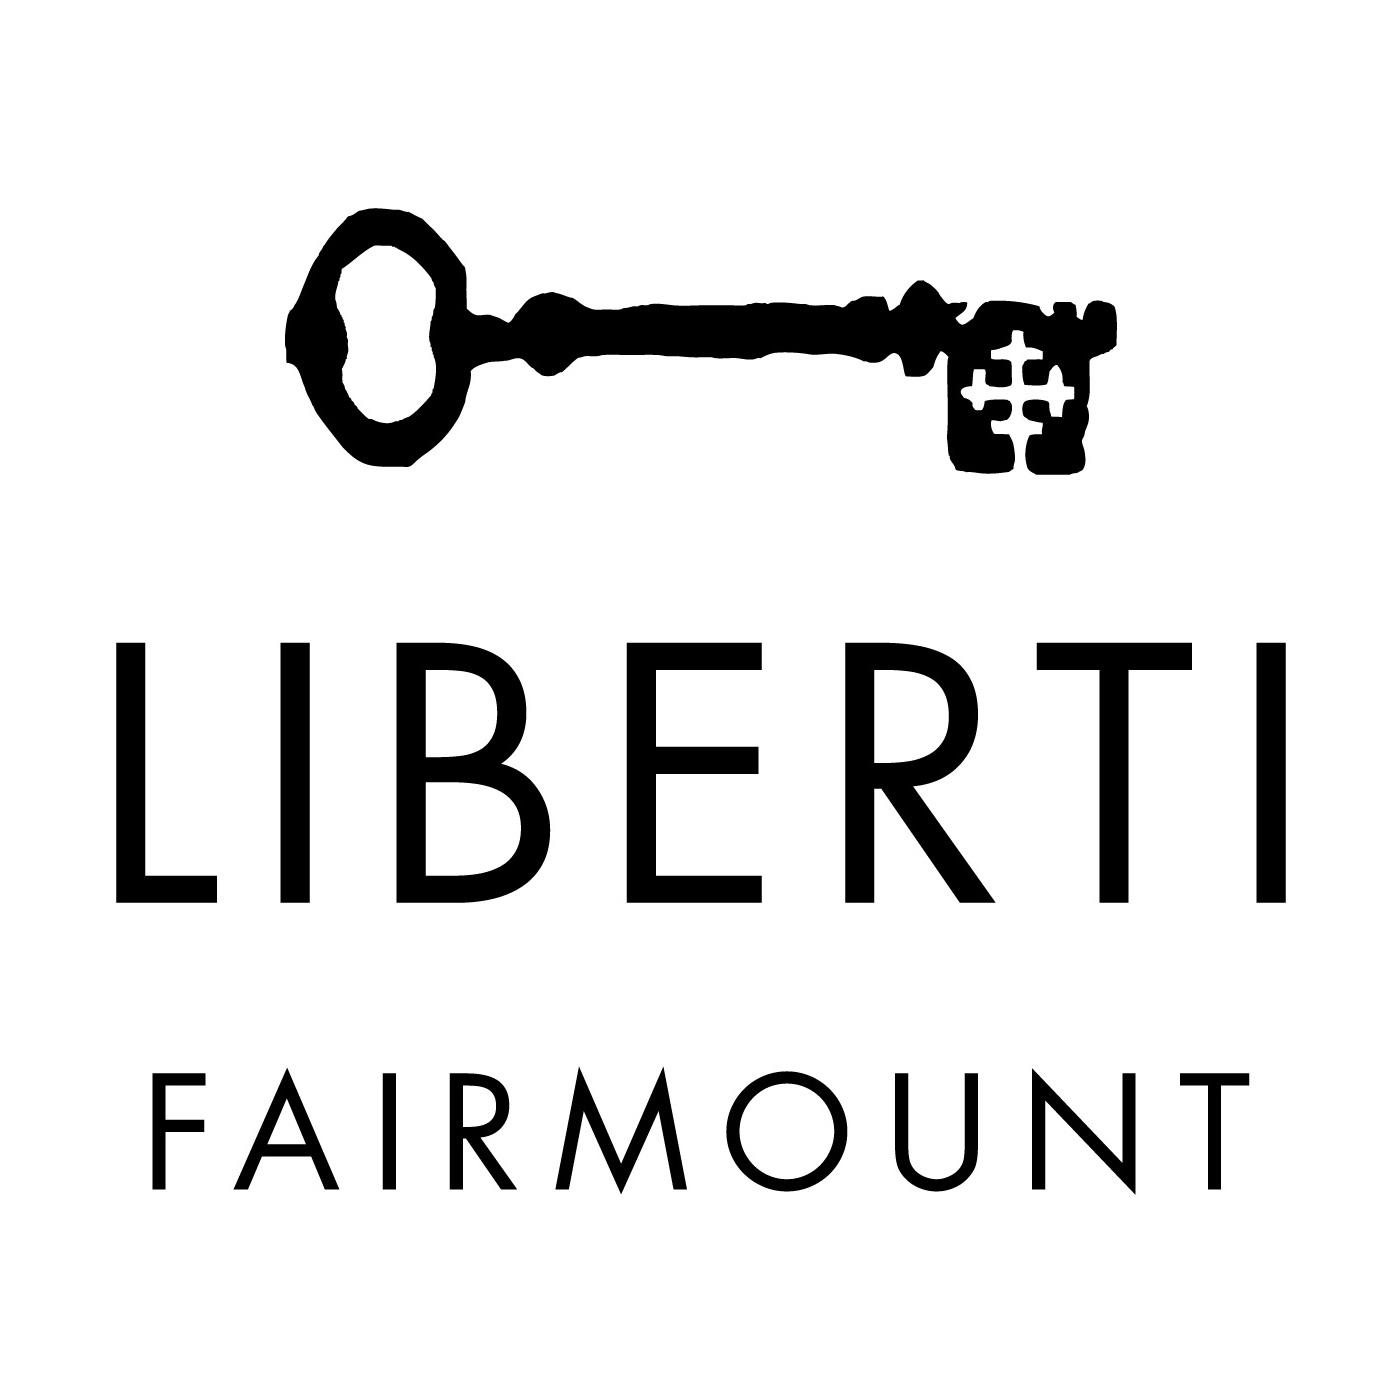 Sermons Podcast - Liberti Fairmount Church